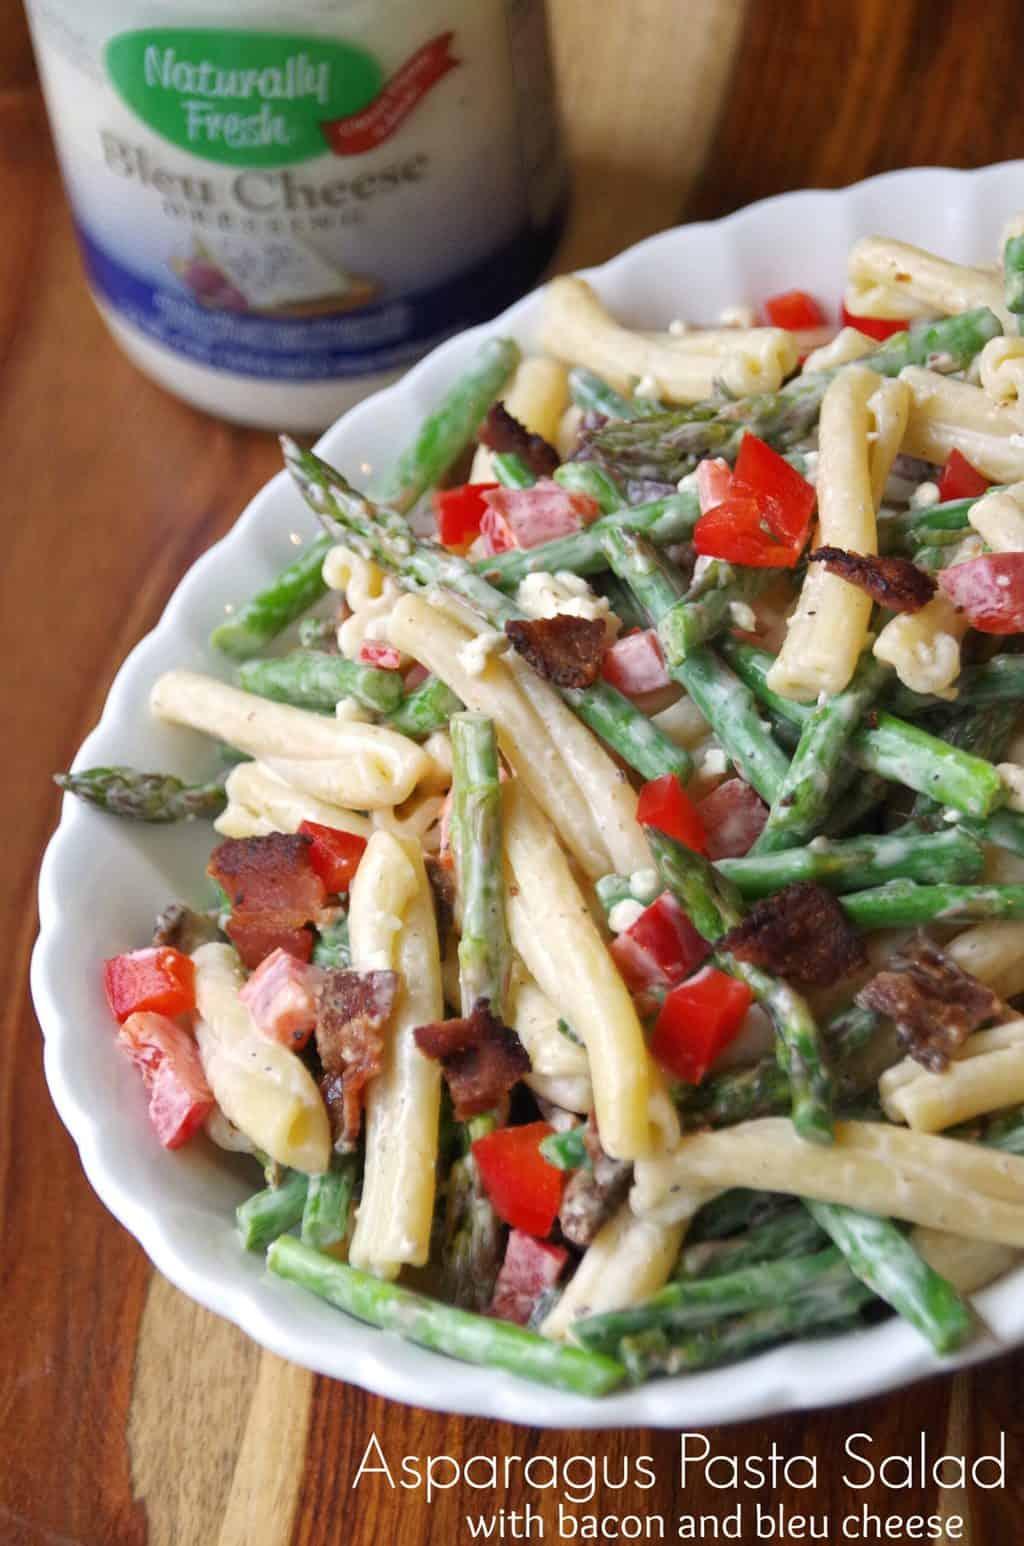 Asparagus Pasta Salad Recipe with Bacon and Bleu Cheese